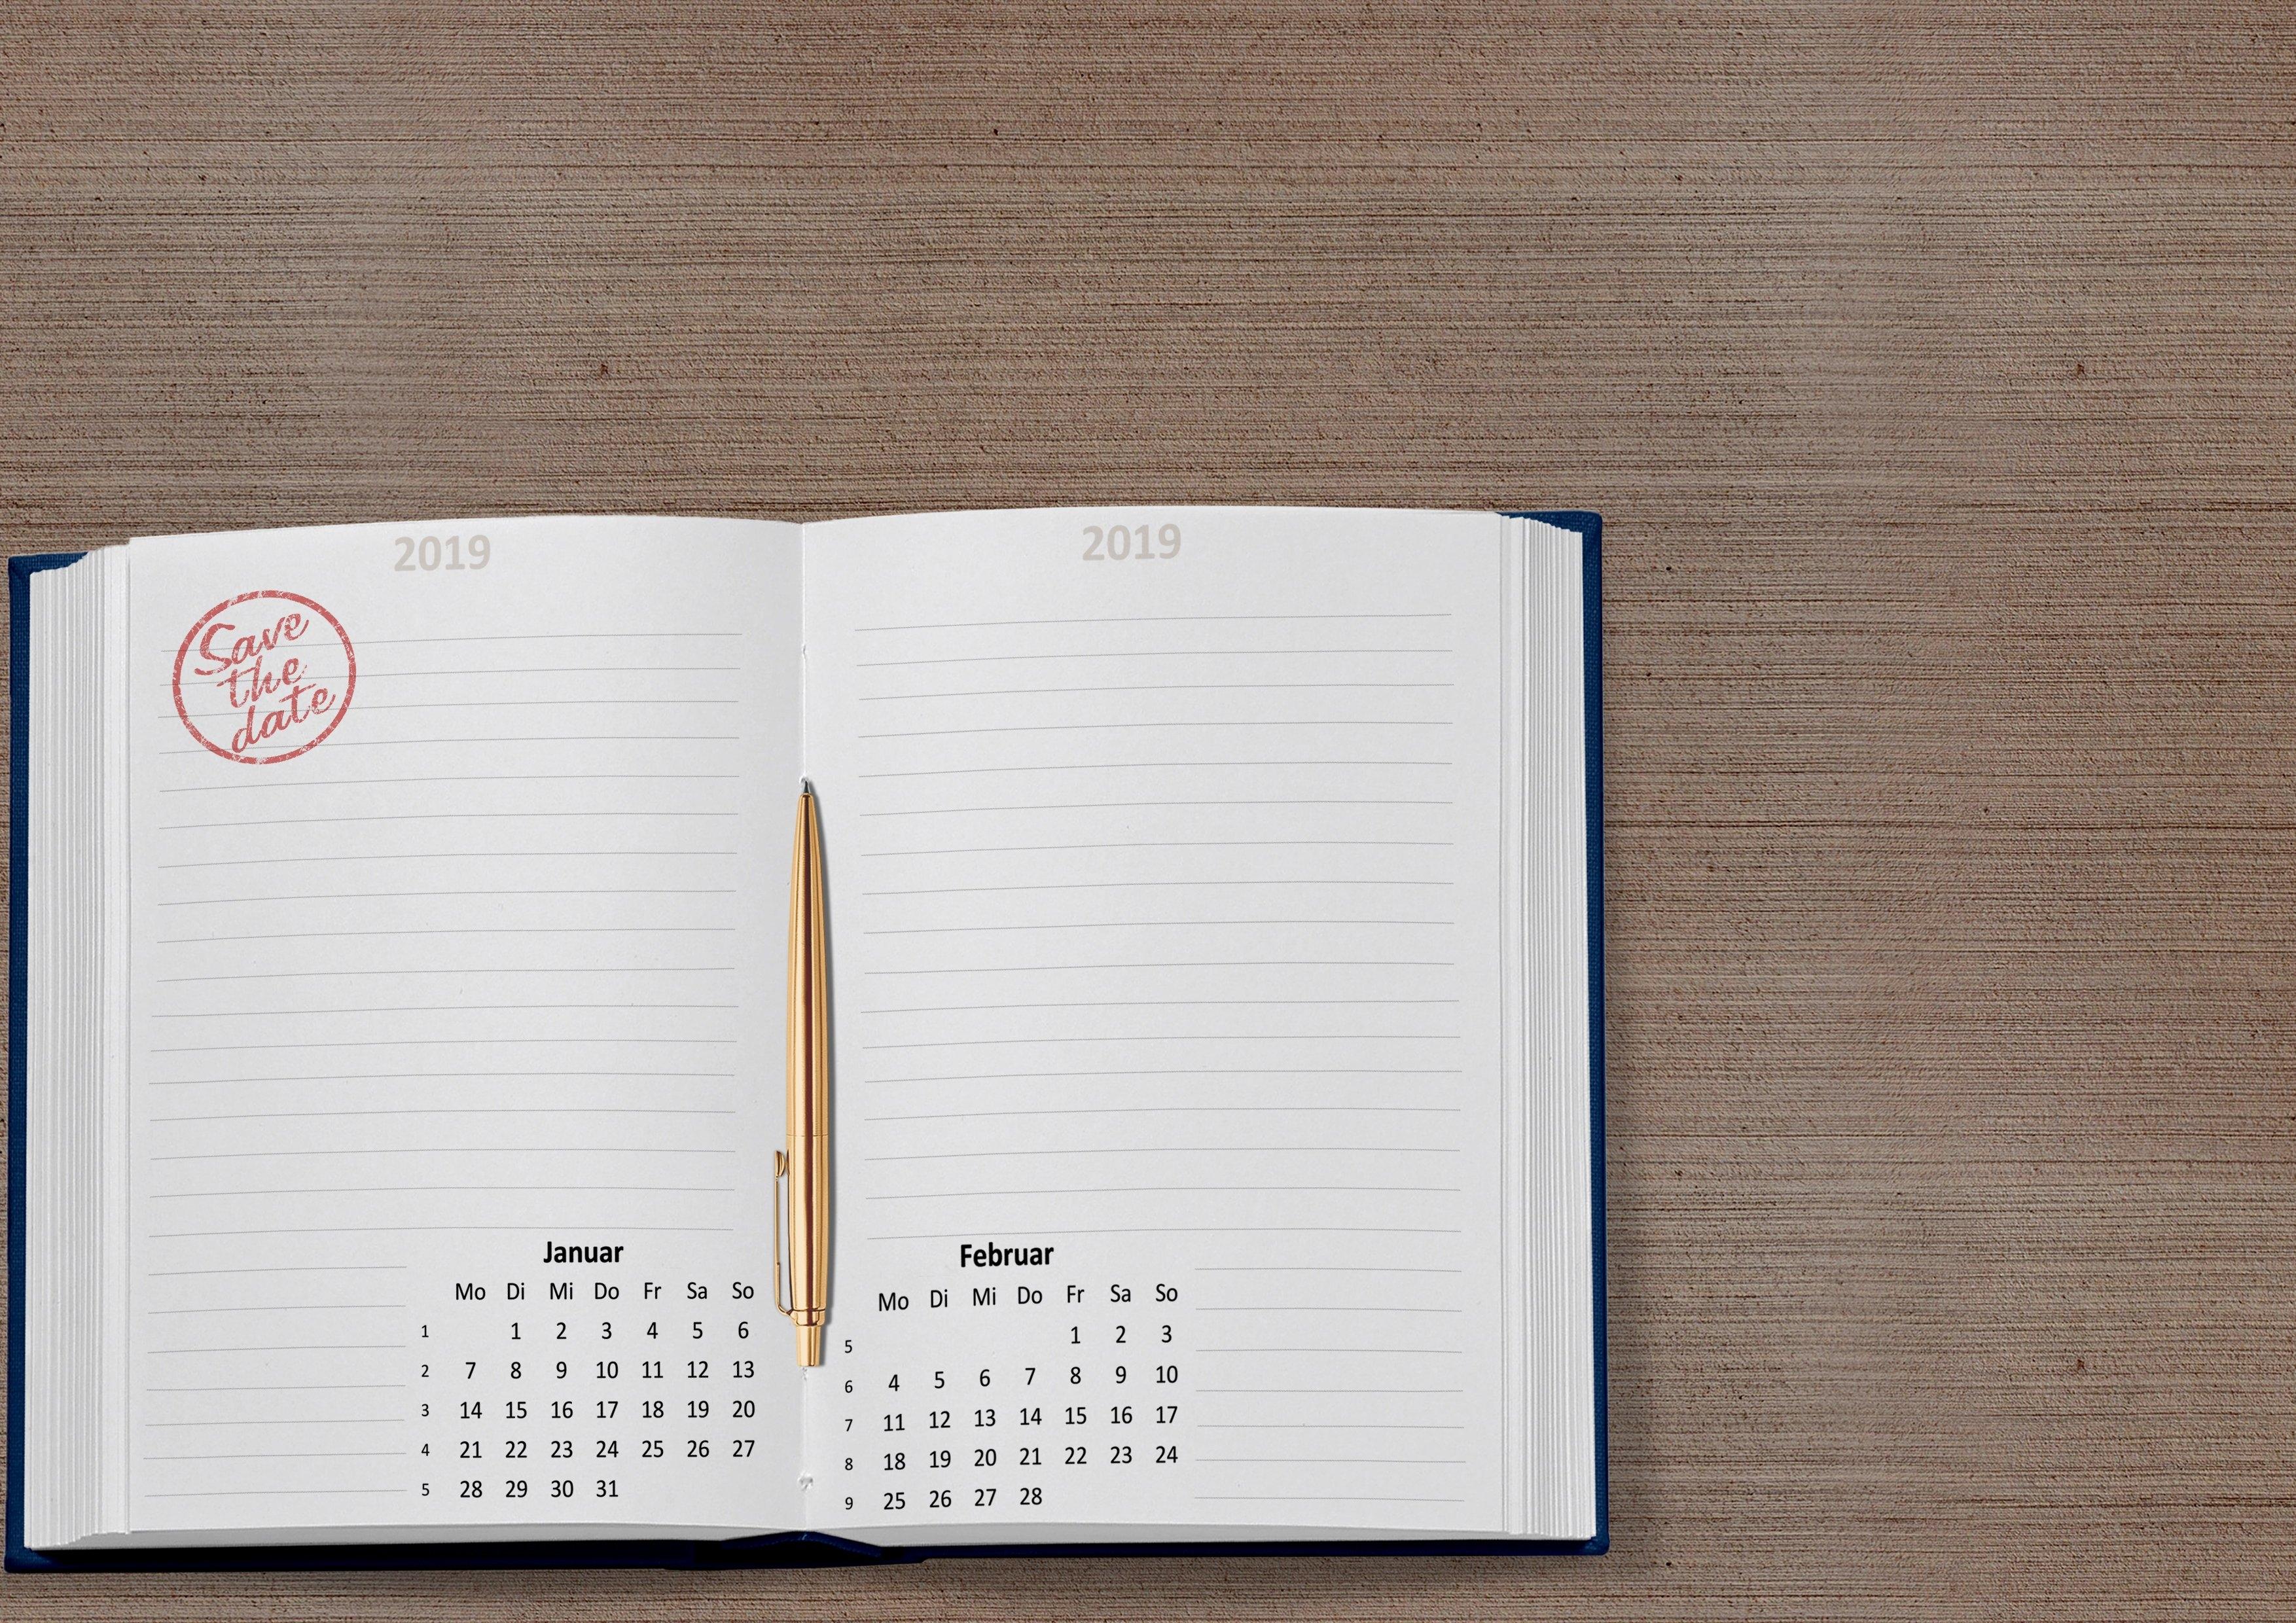 Free Images : Calendar, 2019, Date, January, February, Week, Month Calendar 2019 Notebook